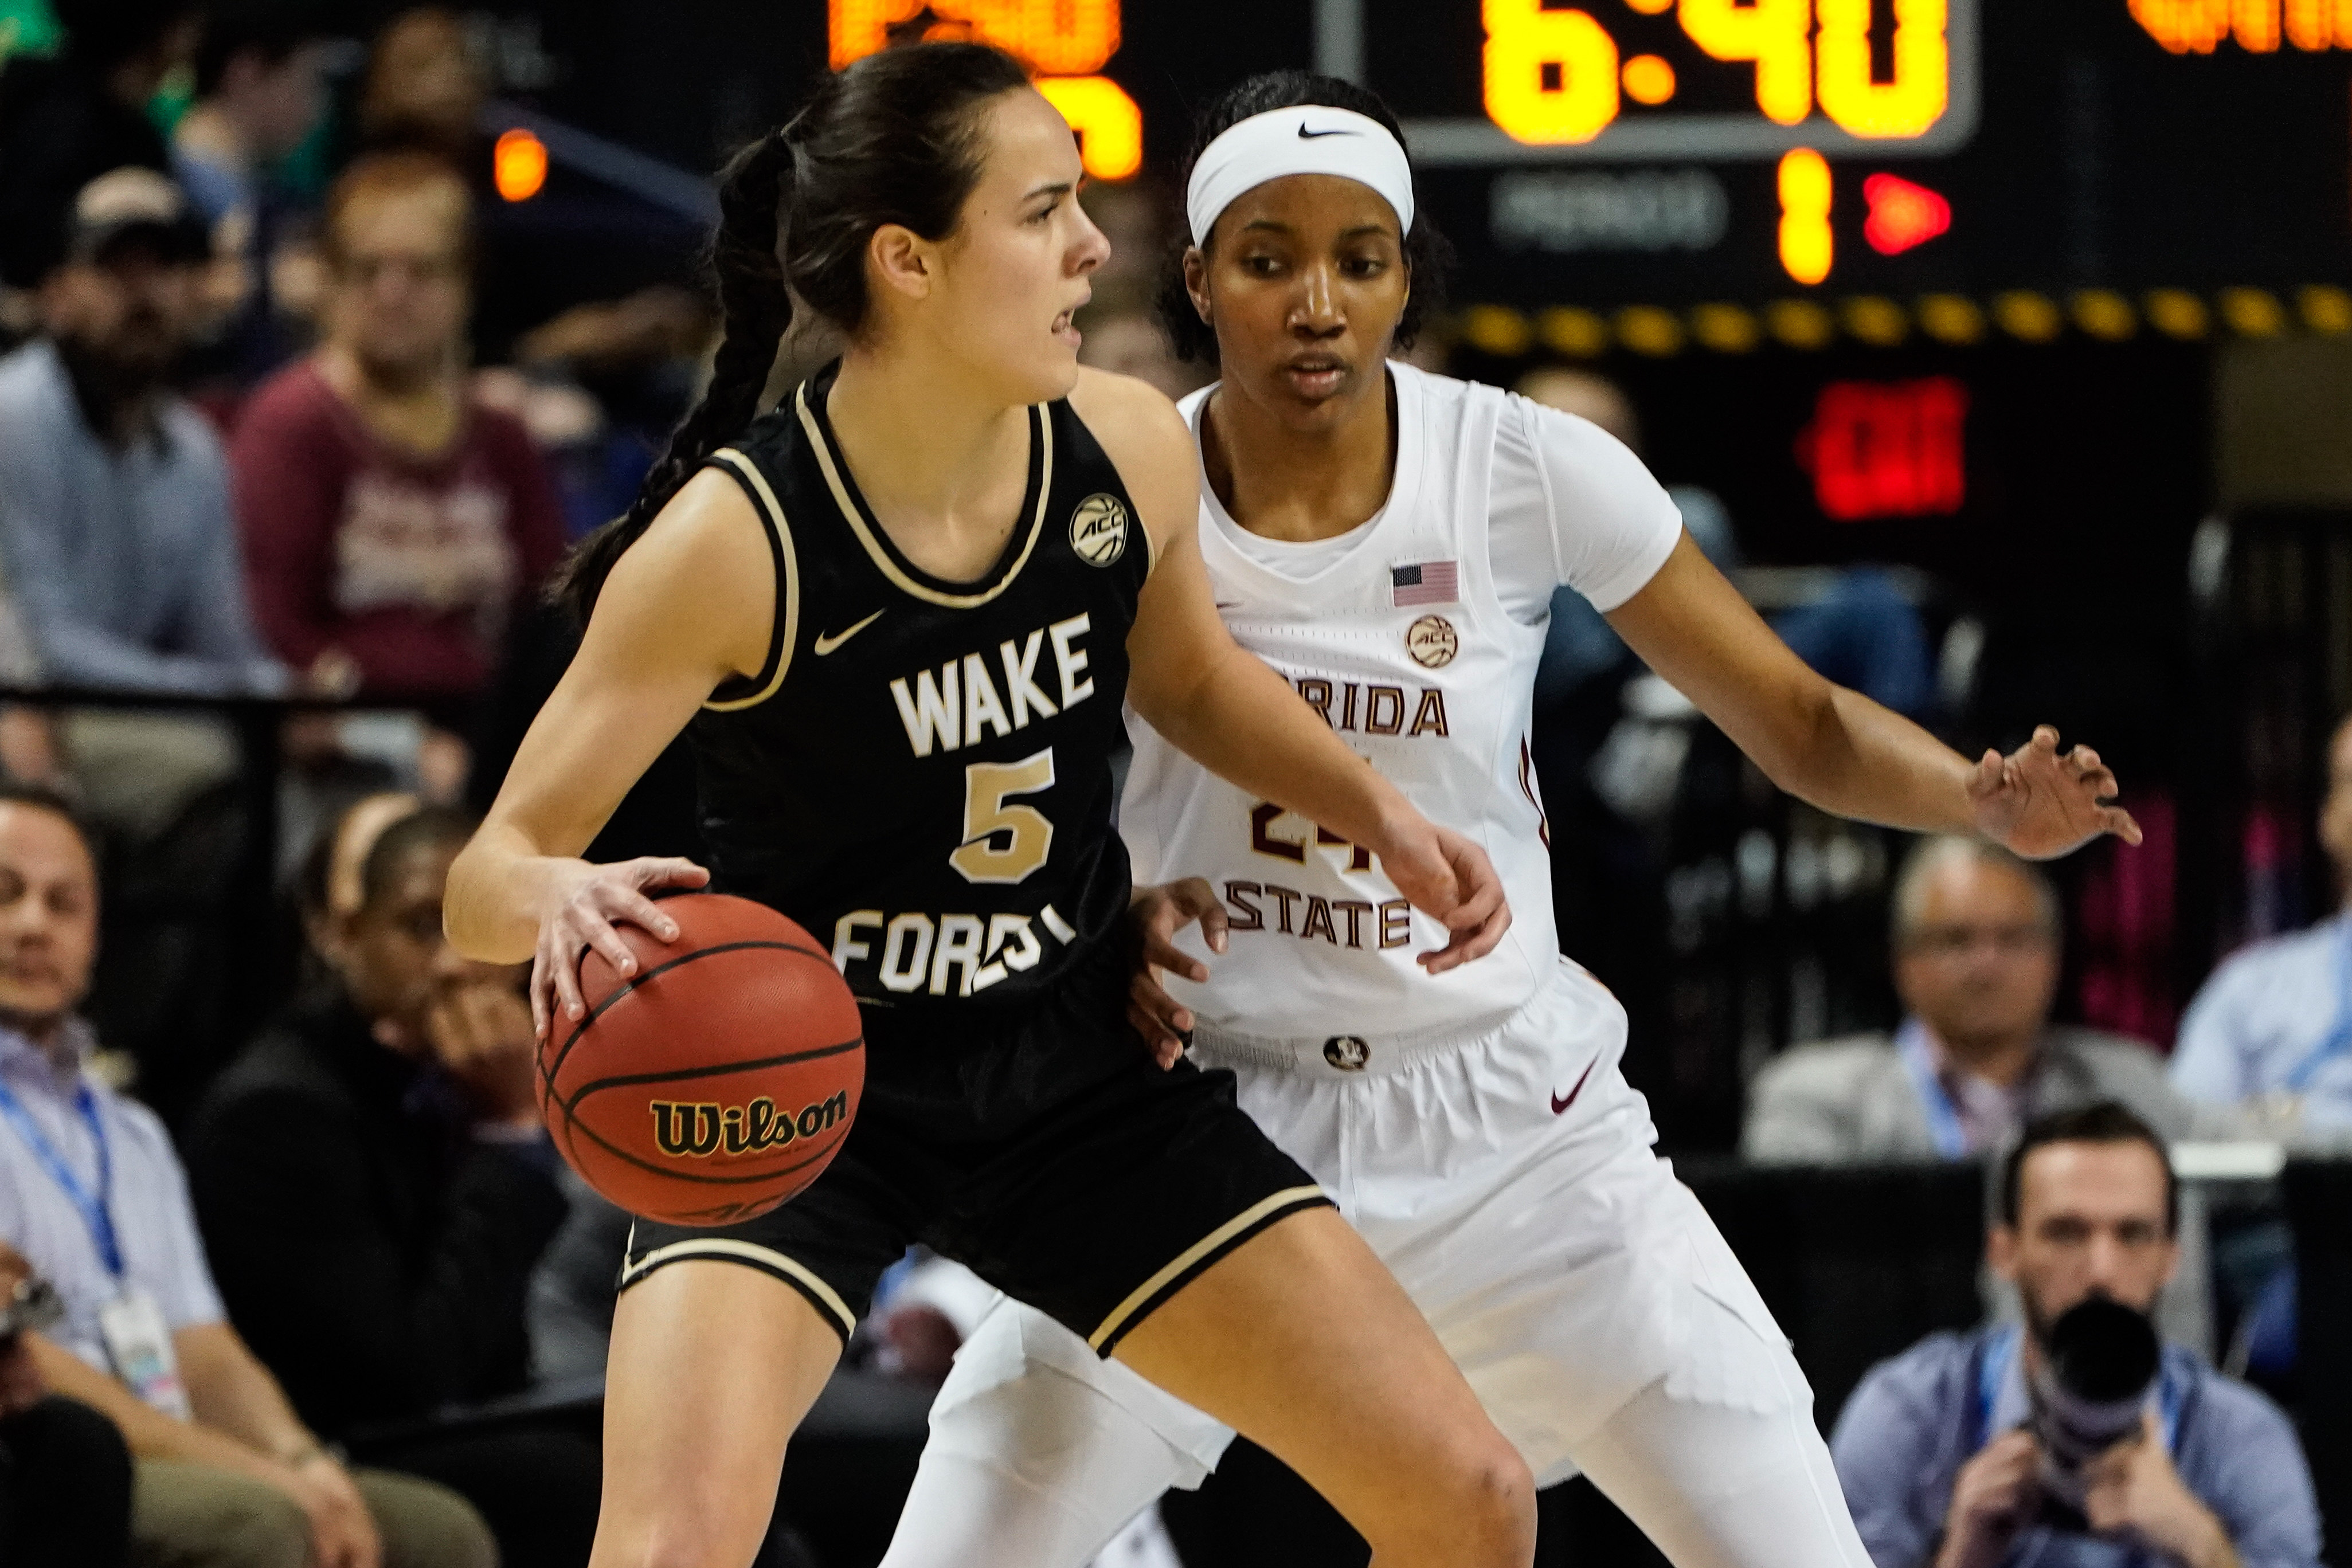 NCAA Womens Basketball: ACC Tournament - Wake Forest vs. Florida State